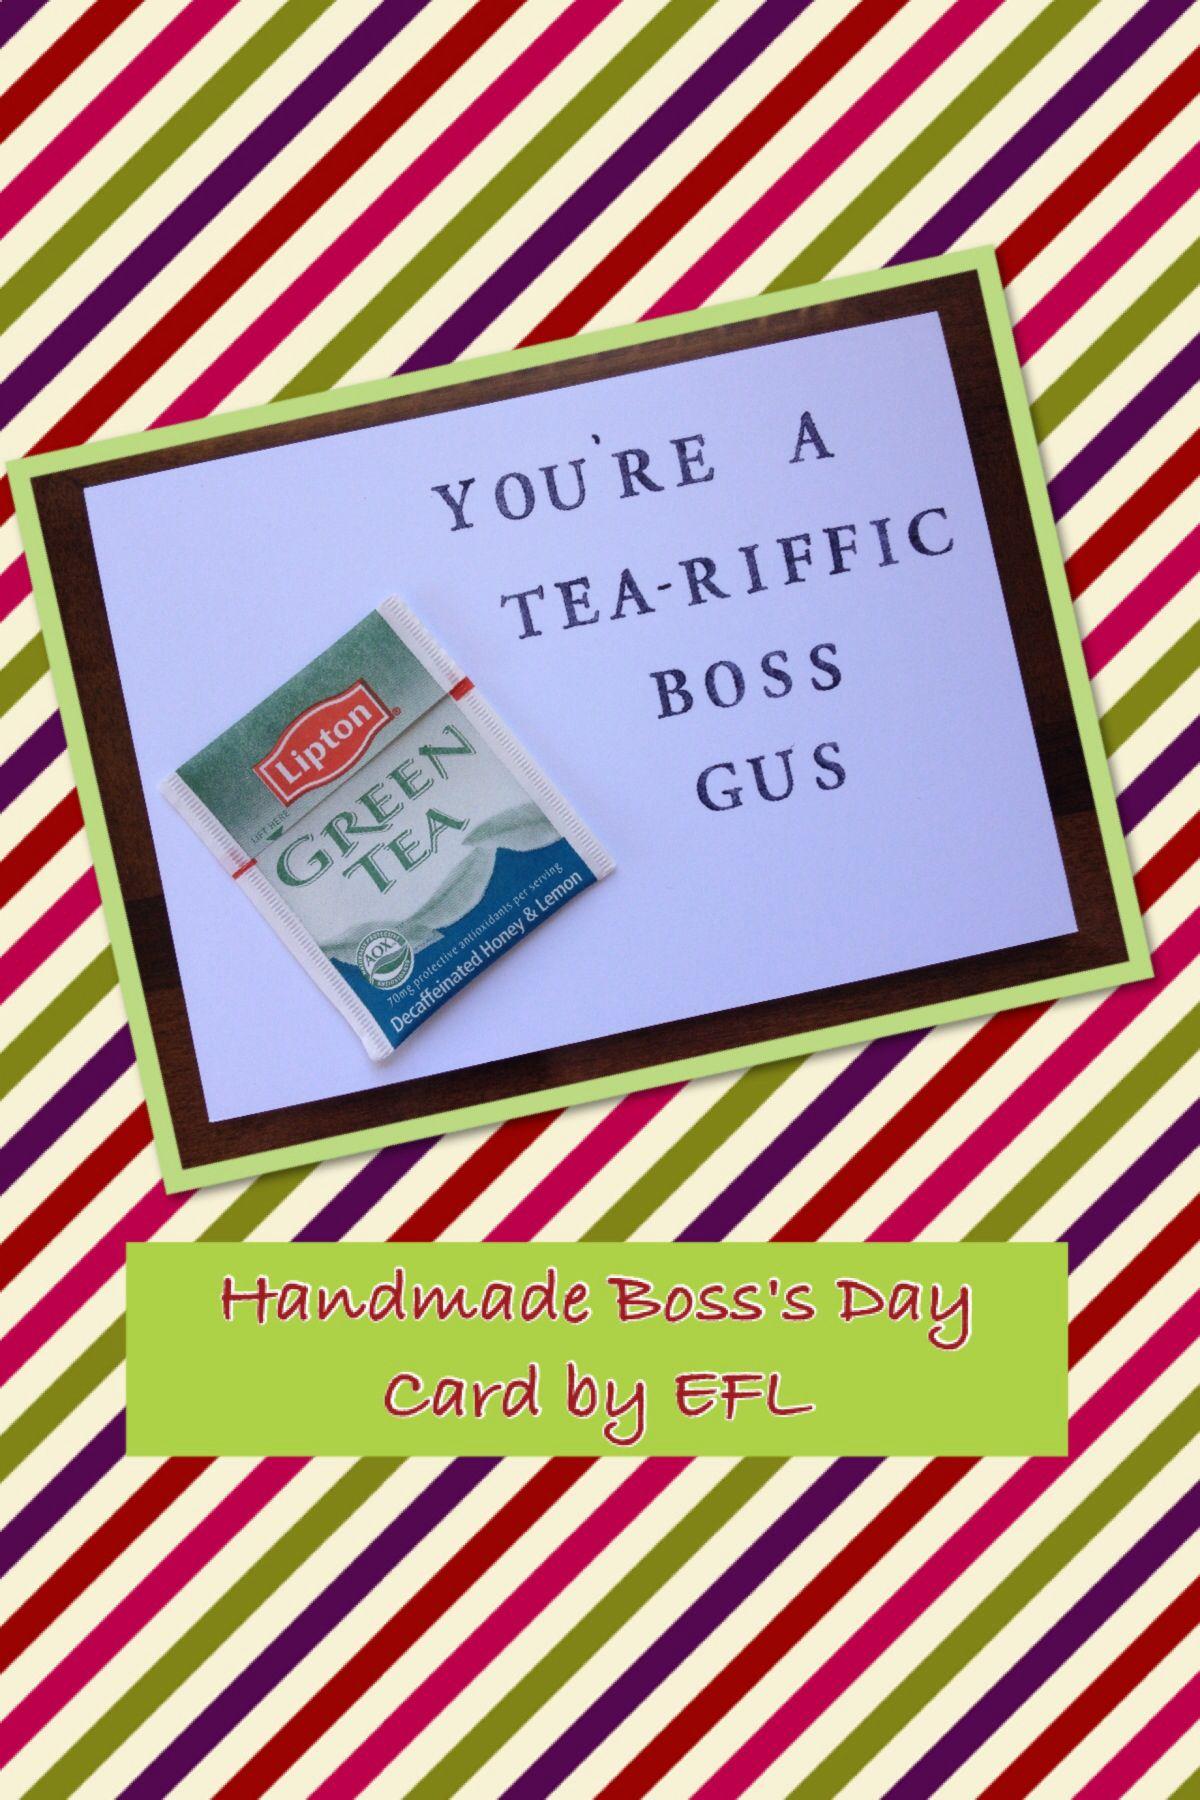 My Handmade Boss's Day Cardefl. | My Homemade Cardsefl - Boss Day Cards Free Printable